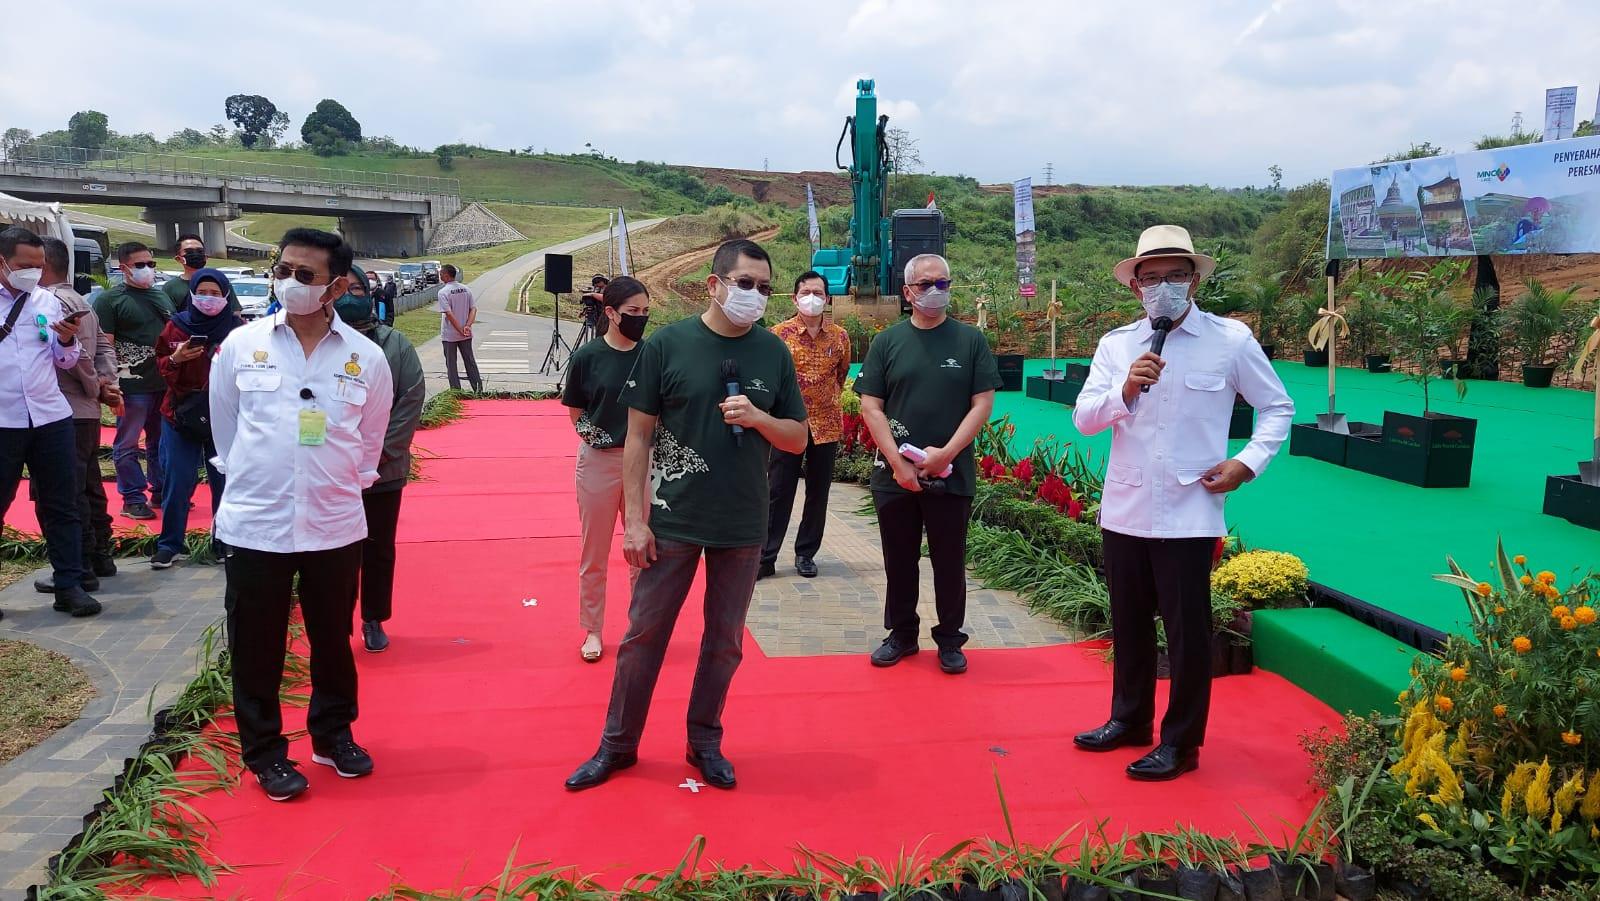 Kementan Bakal Hiasi Lido World Garden dengan Tanaman Hasil Inovasi